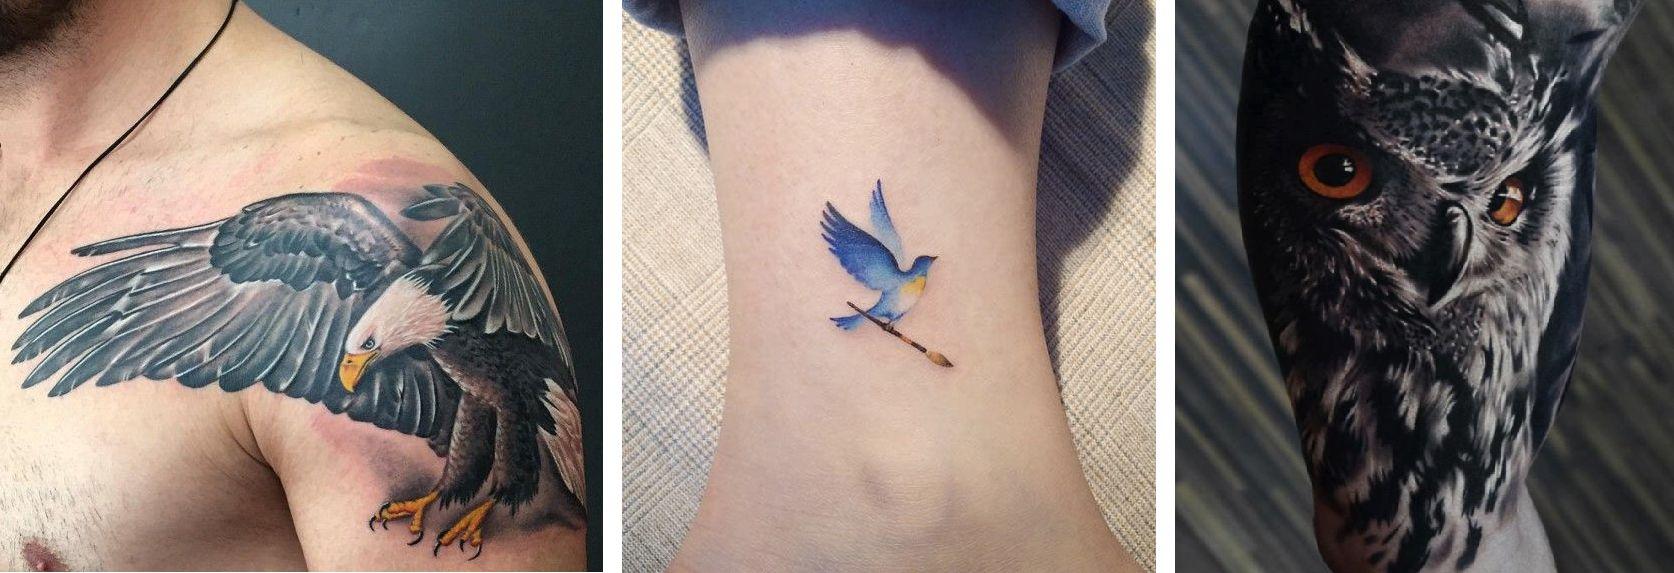 Tatuaggio animali volatili